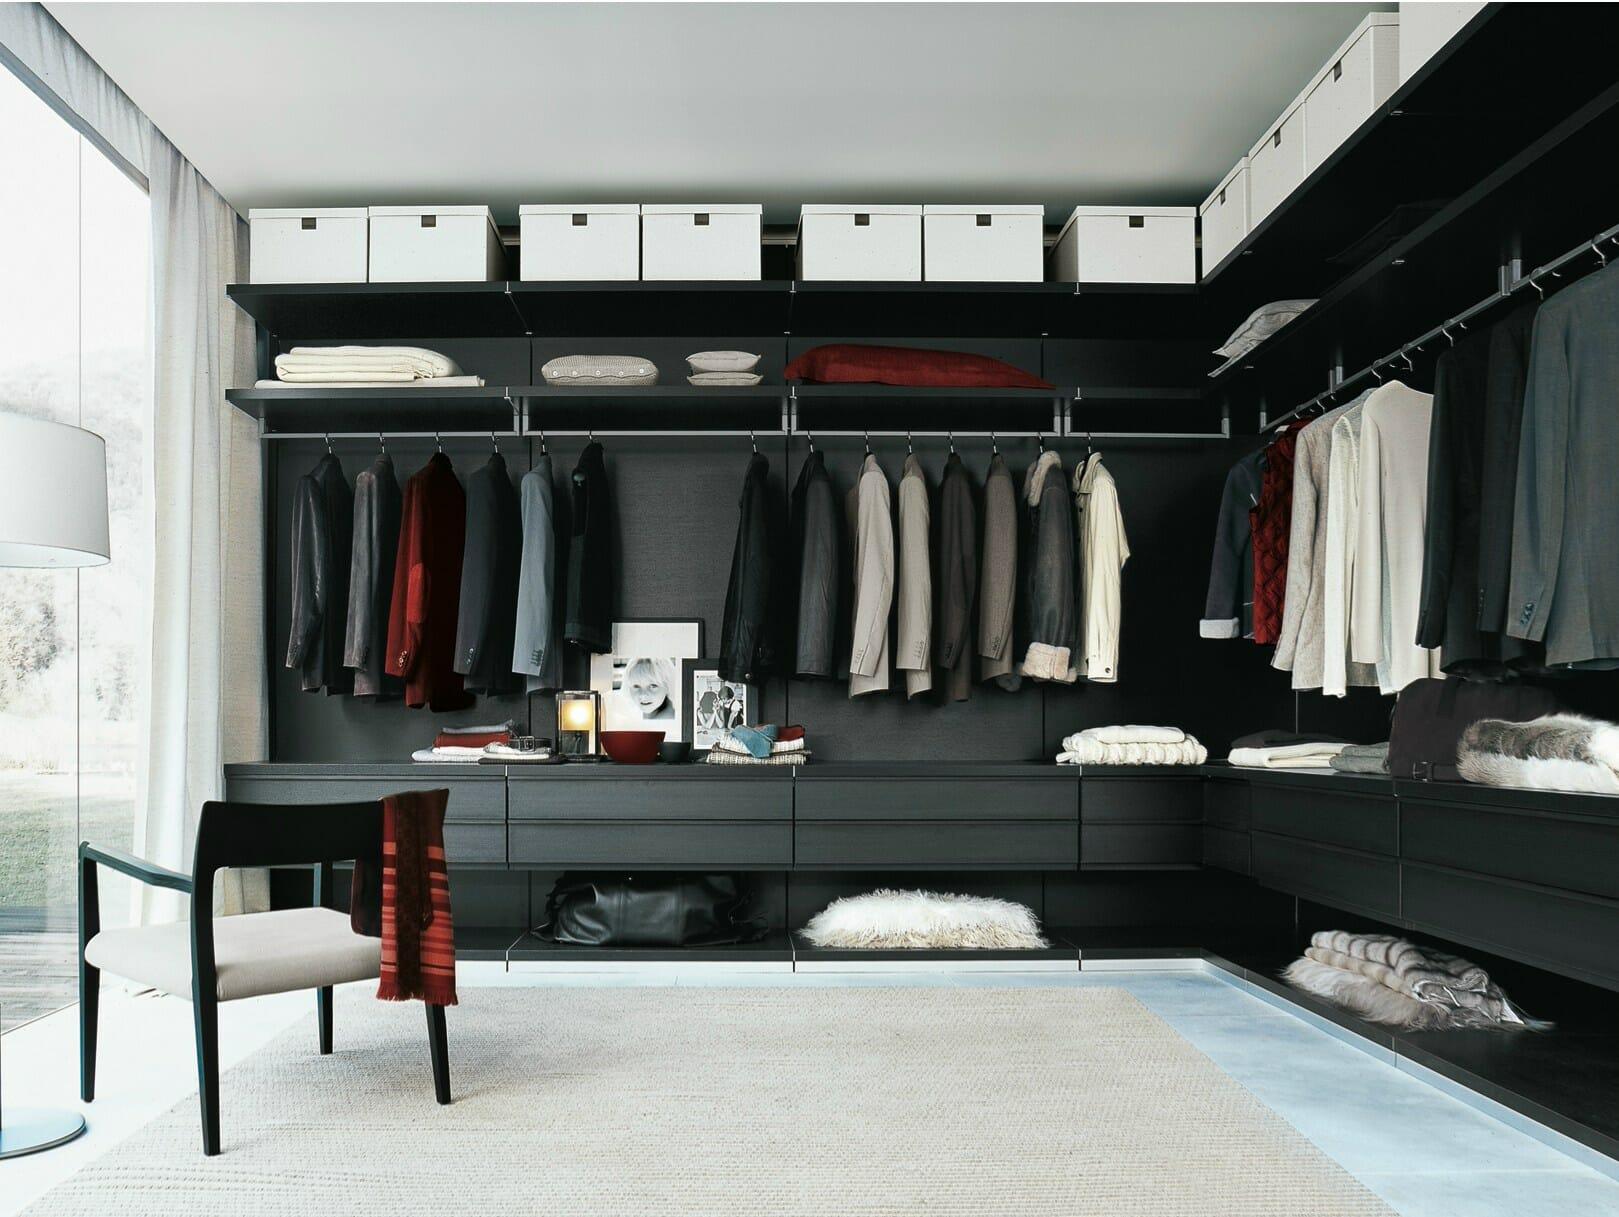 Cabine armadio Poliform Torino | BLIVING